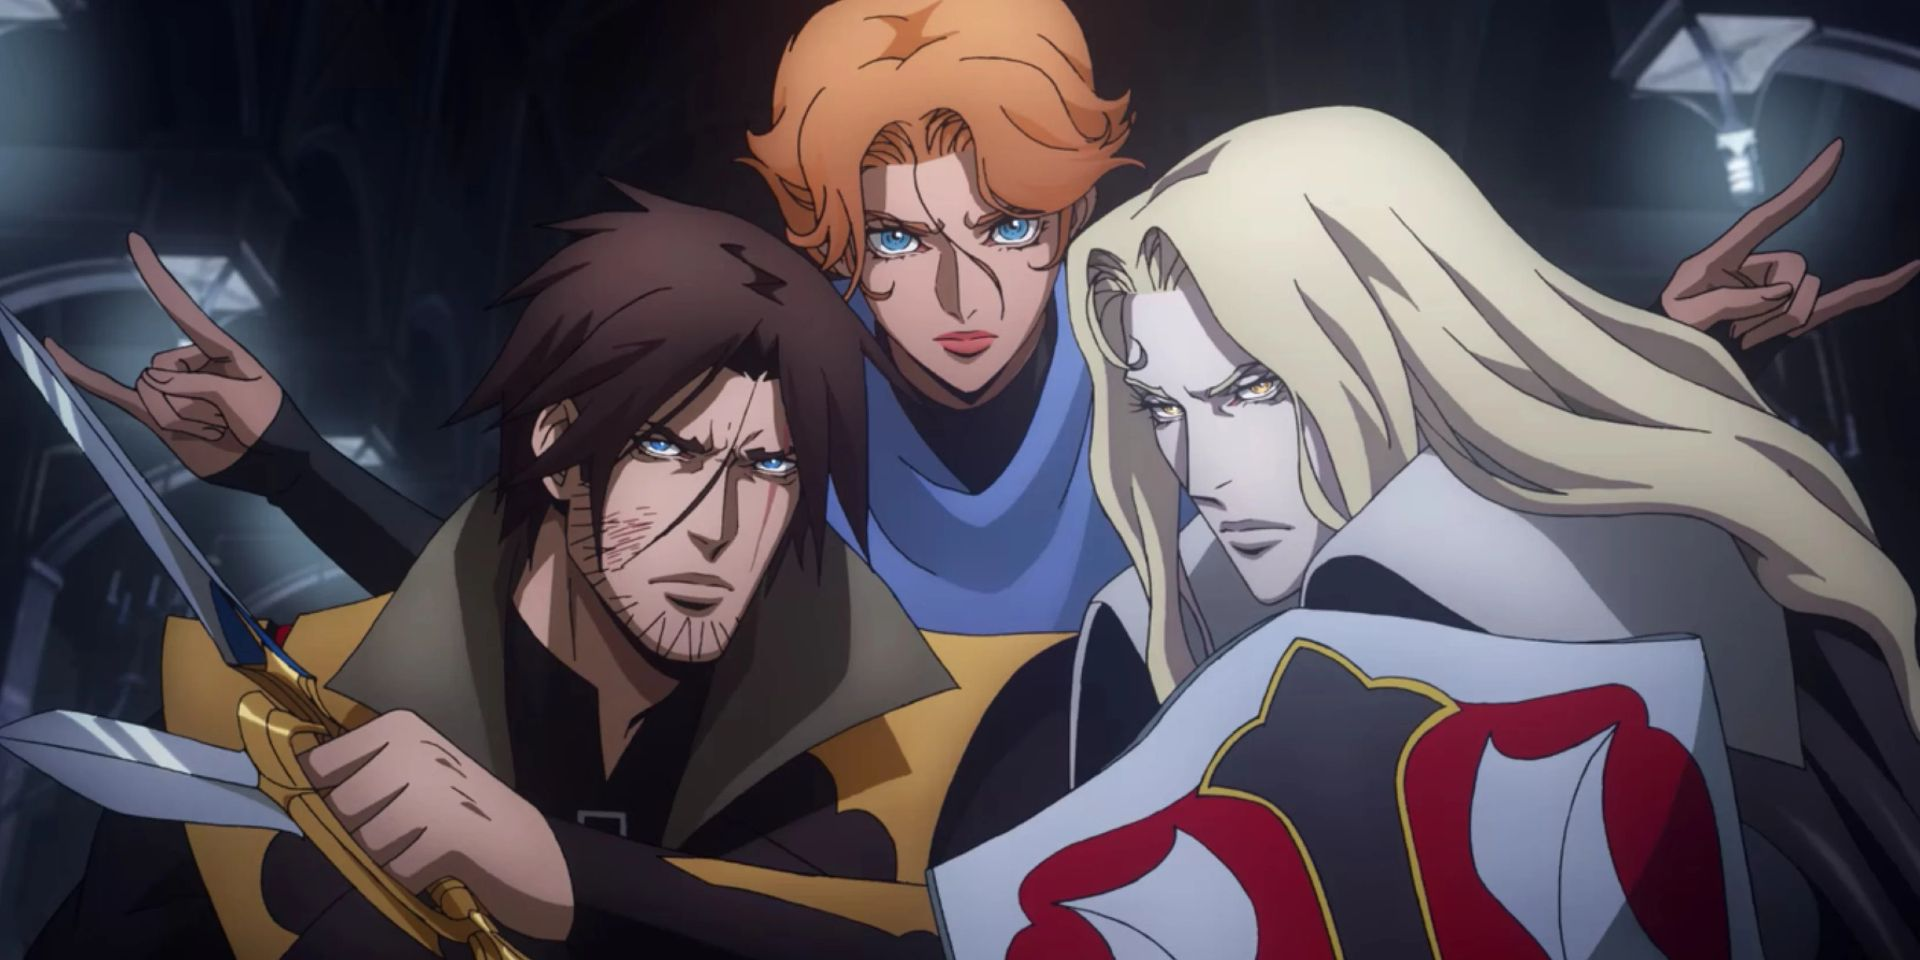 Castlevania Anime Series Full Review